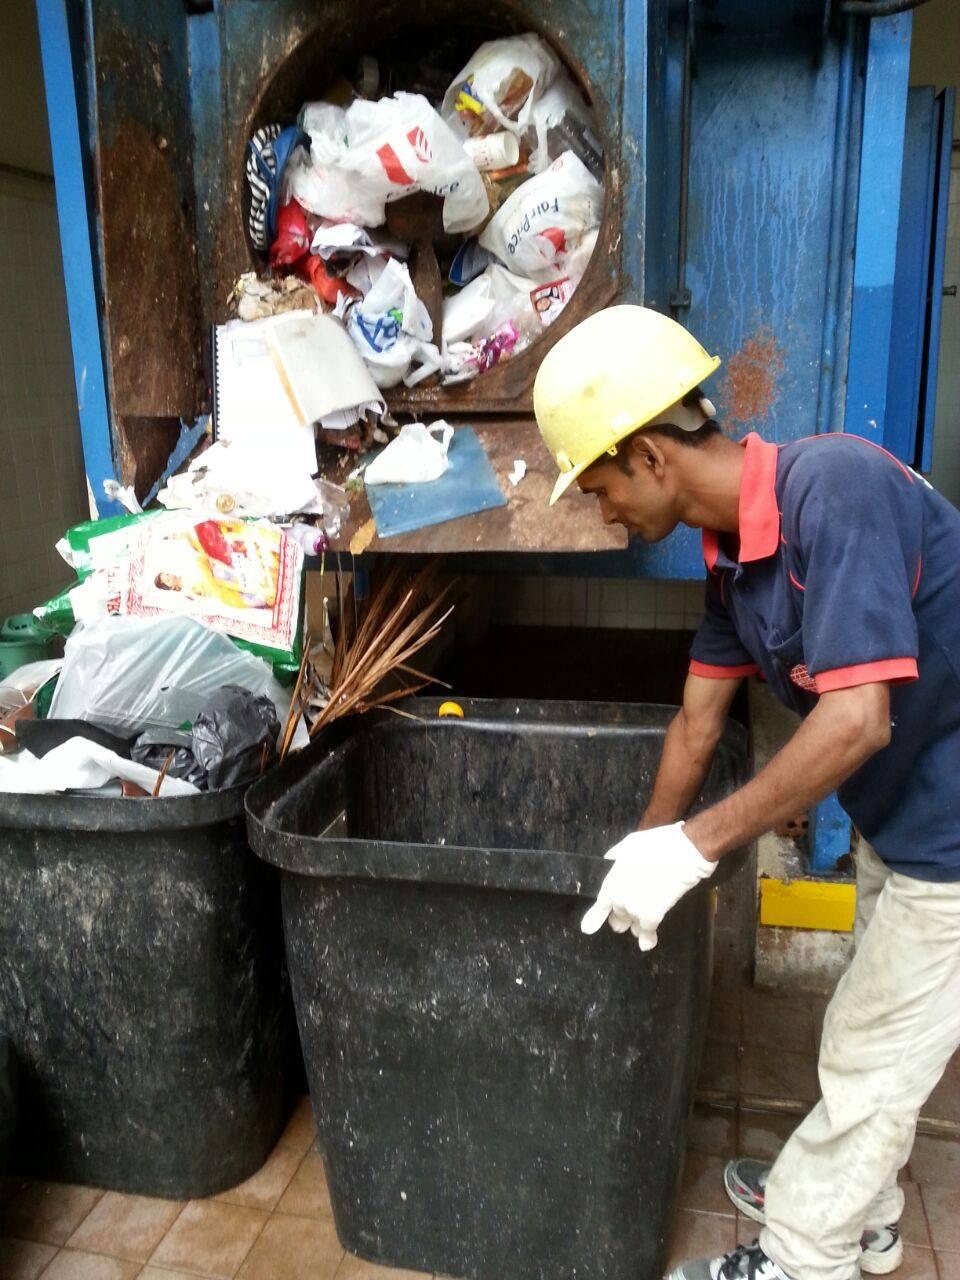 rubbish chute retrieval - town council services